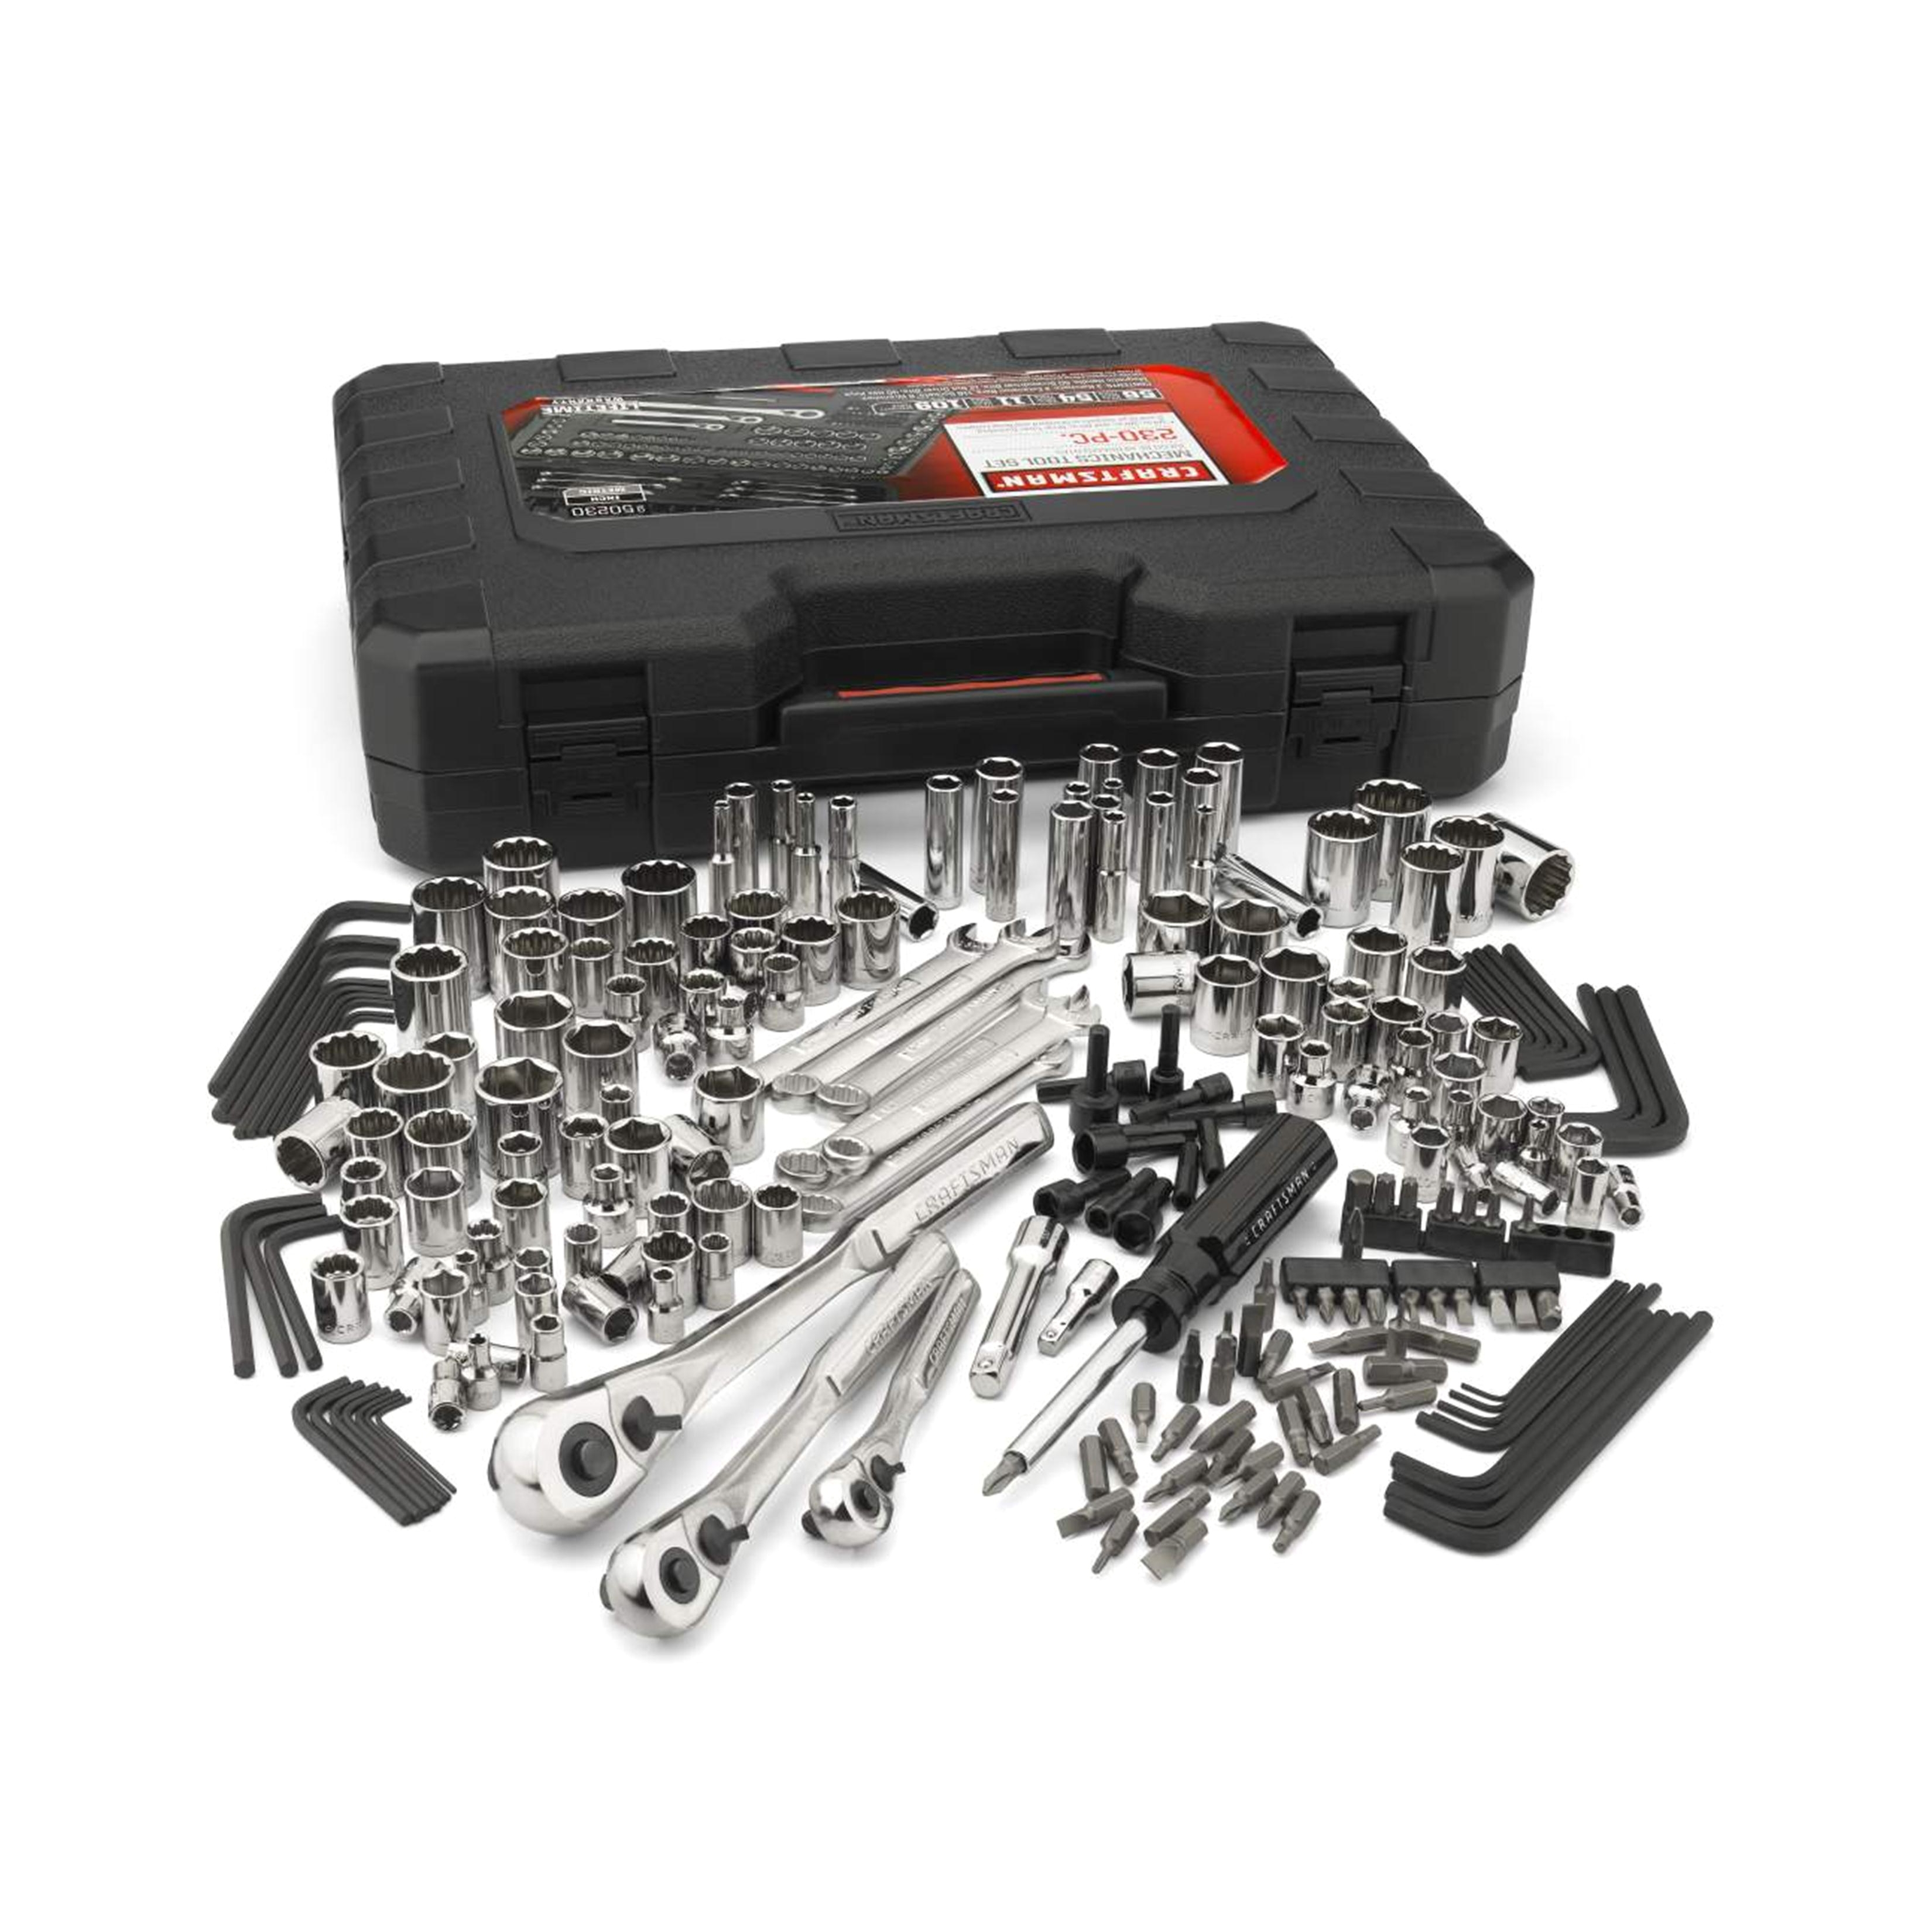 Sears Craftsman socket Rack Craftsman 50230 230 Piece Inch and Metric Mechanic S tool Set